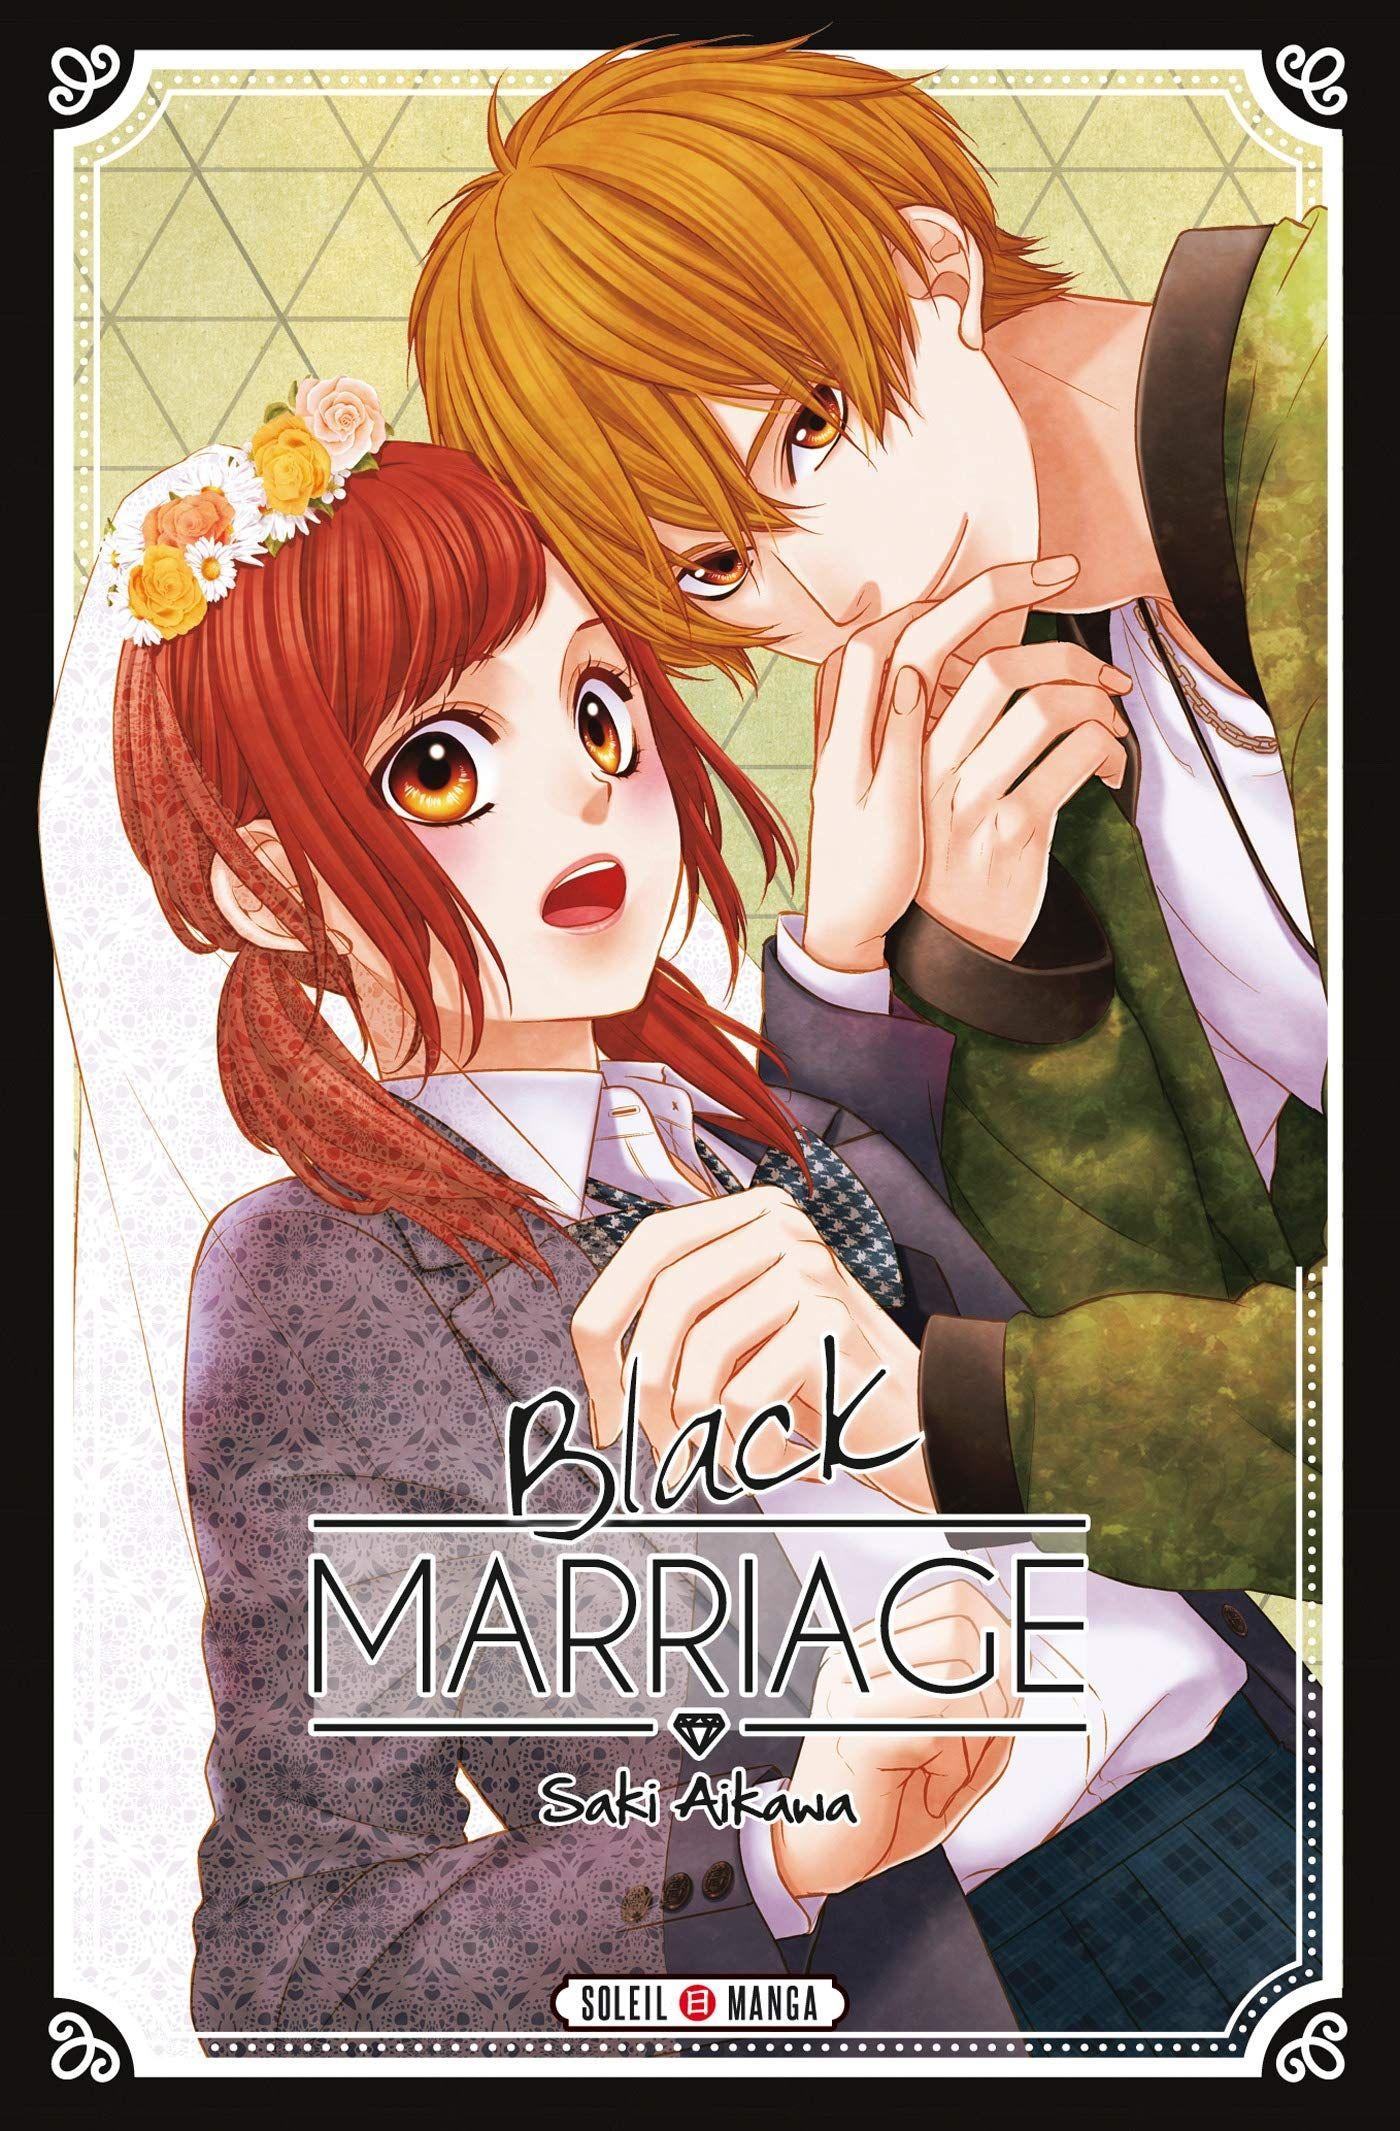 Manga - Black Marriage